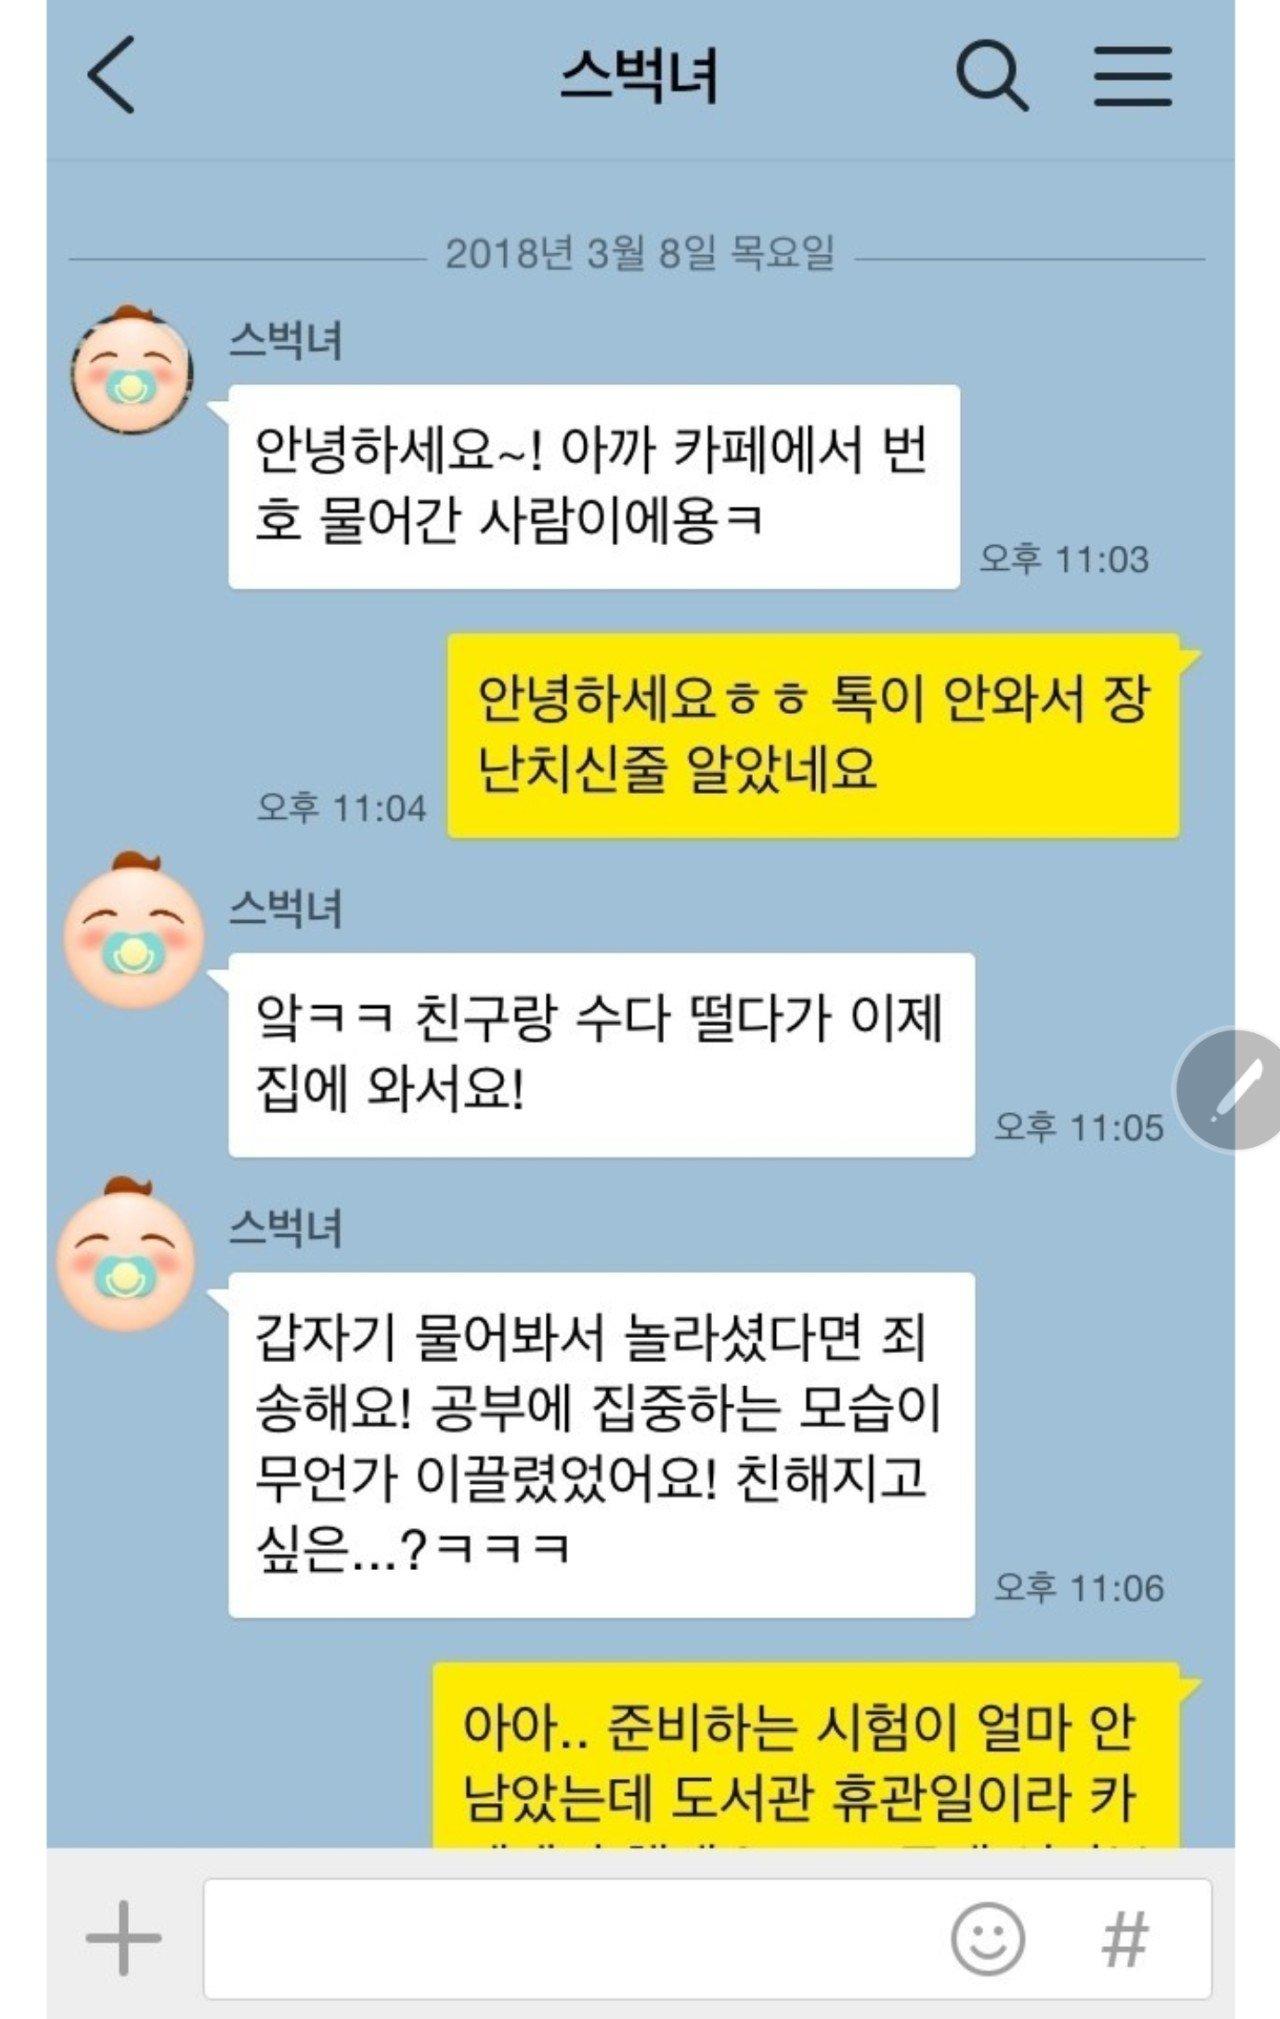 Screenshot_20180312-153559.jpg 남초카페 난리난 번호따인 아재.jpg